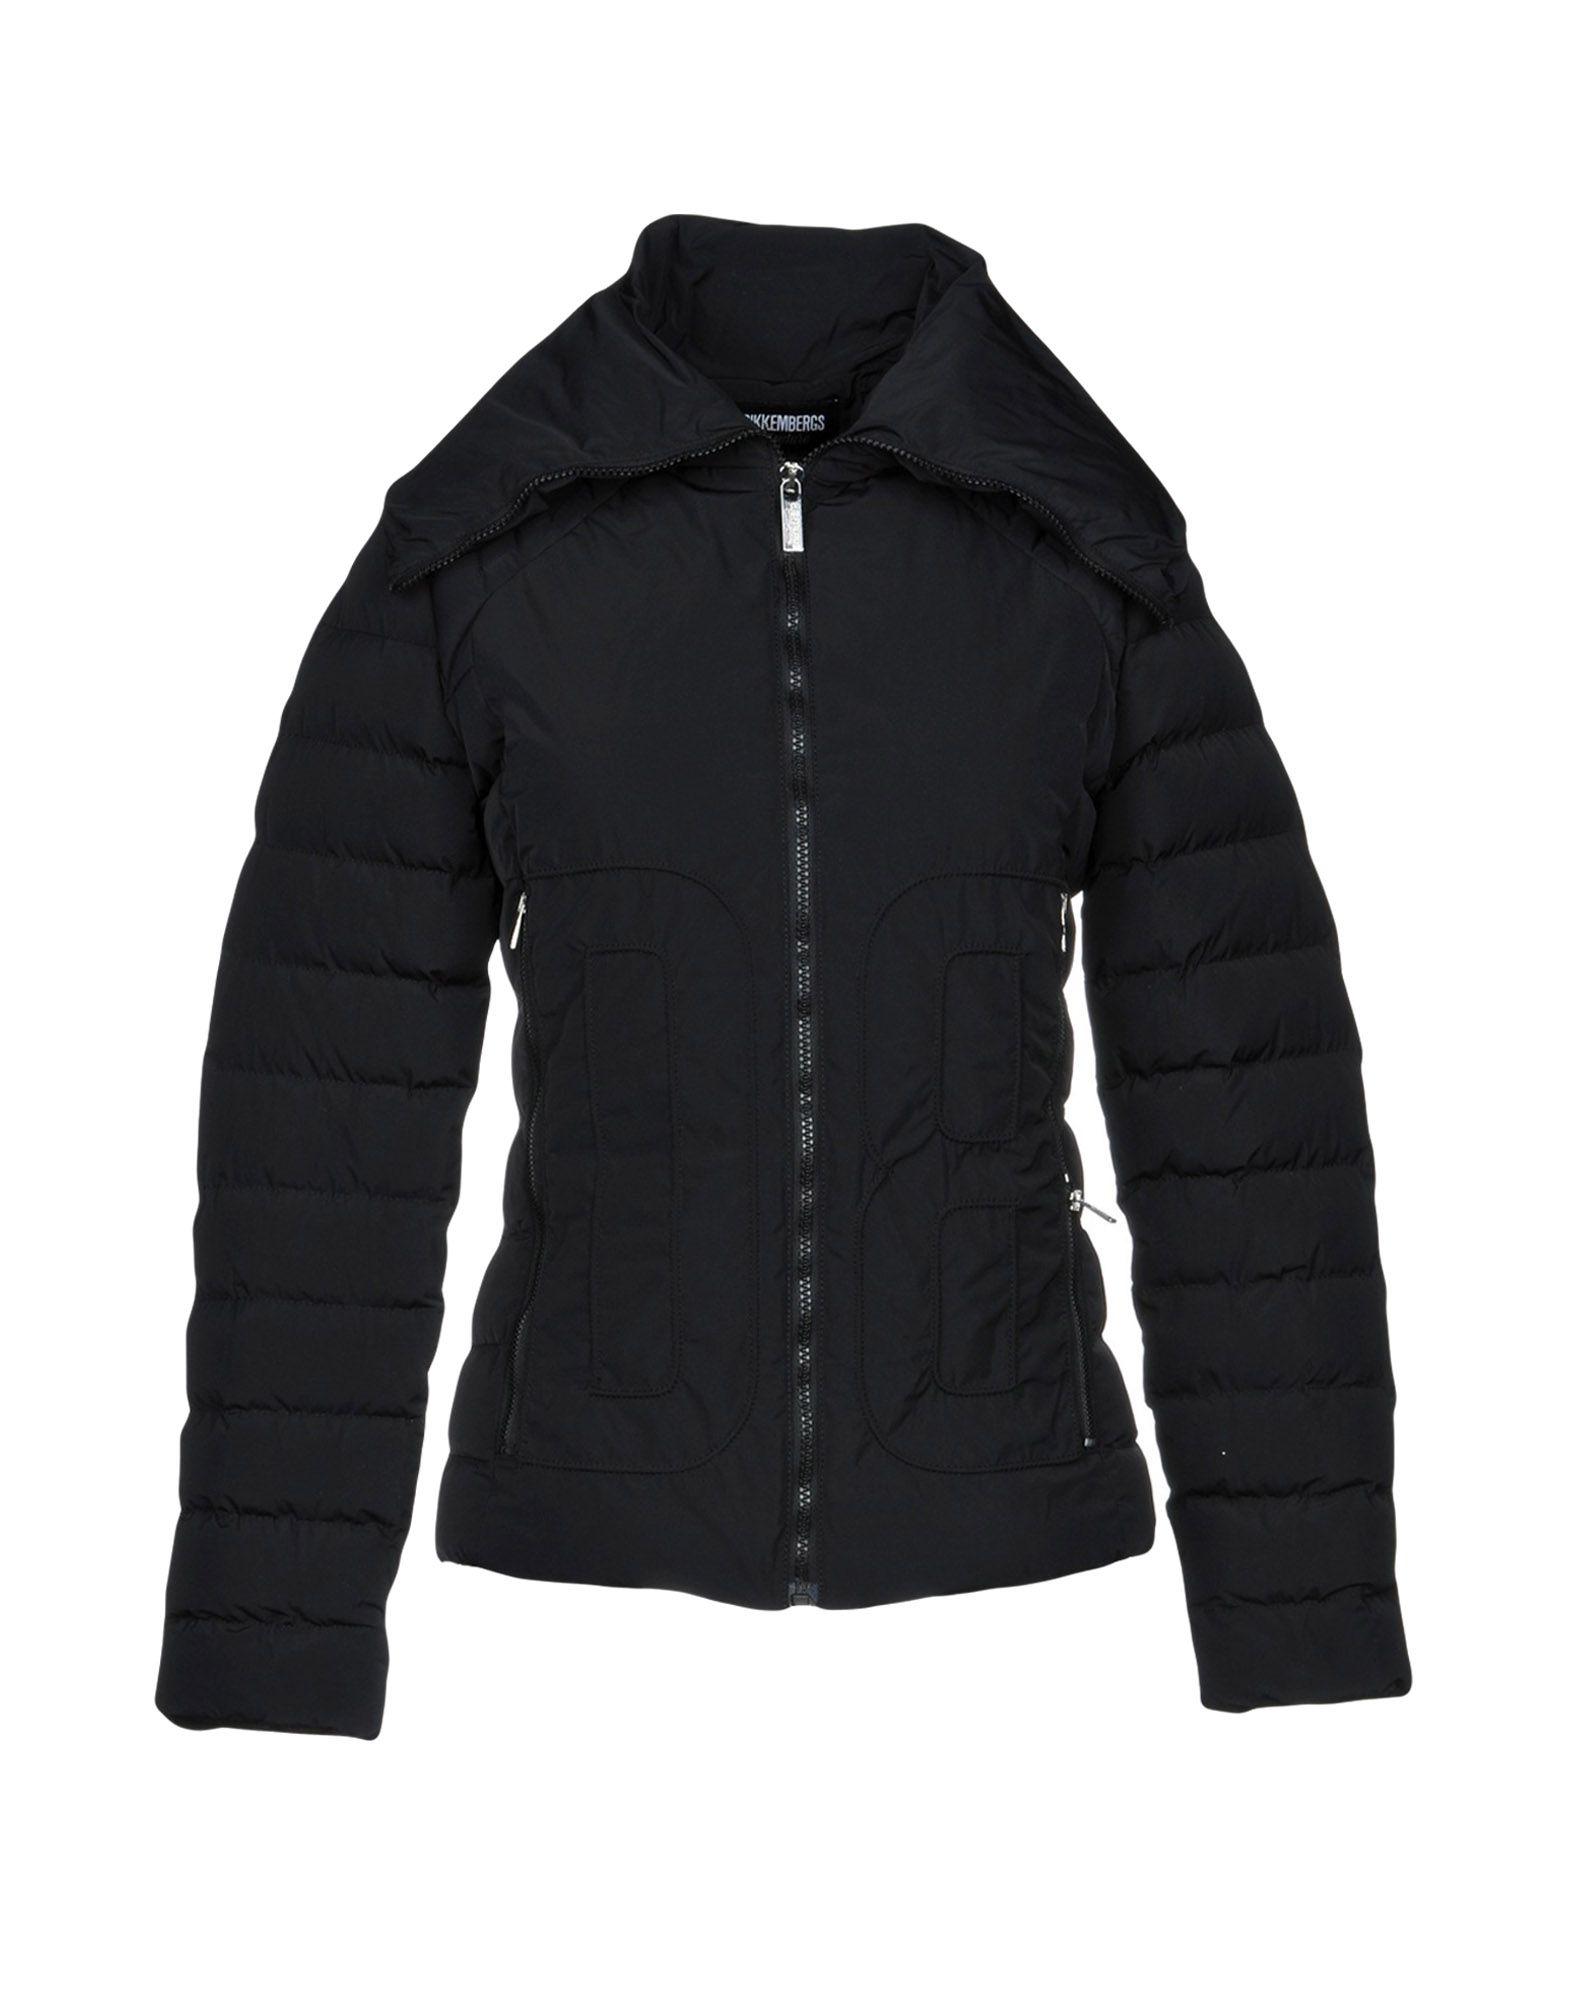 DIRK BIKKEMBERGS Пуховик с синт. наполнителем dirk bikkembergs sport couture пиджак